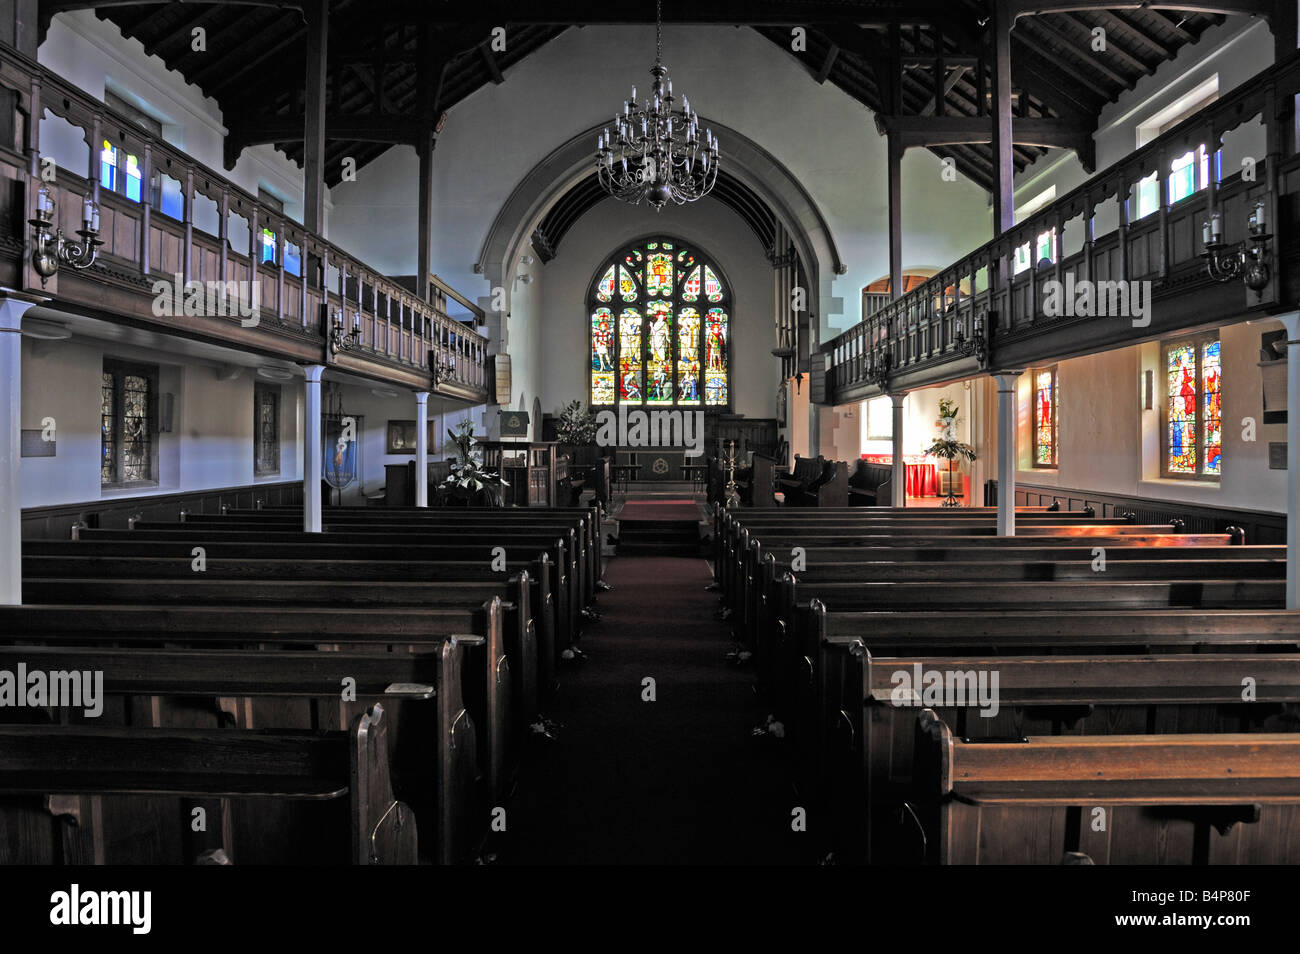 interior-looking-east-church-of-saint-lawrence-longridge-lancashire-B4P80F.jpg